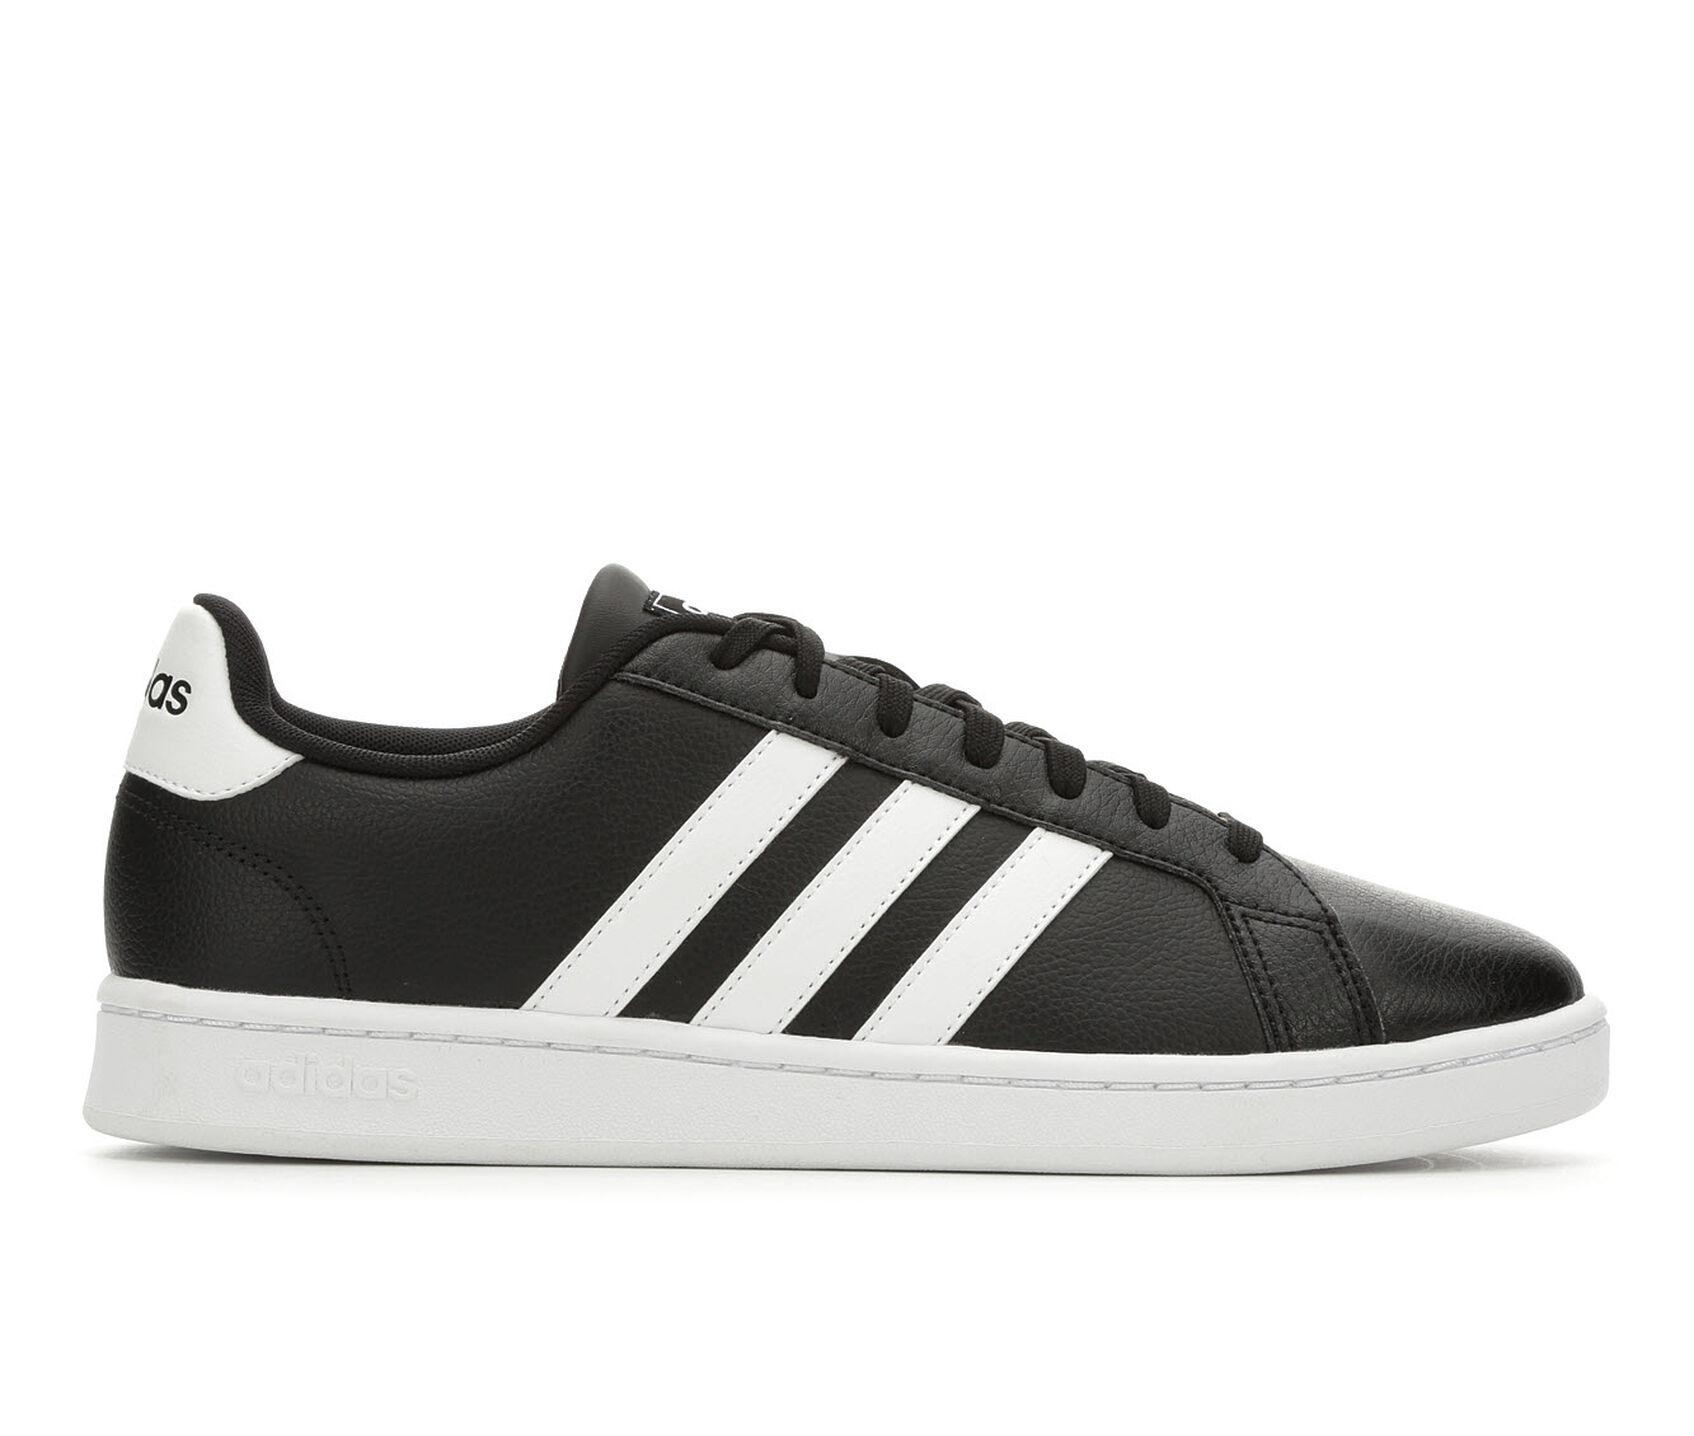 643d7e90a ... Adidas Grand Court Retro Sneakers. Previous